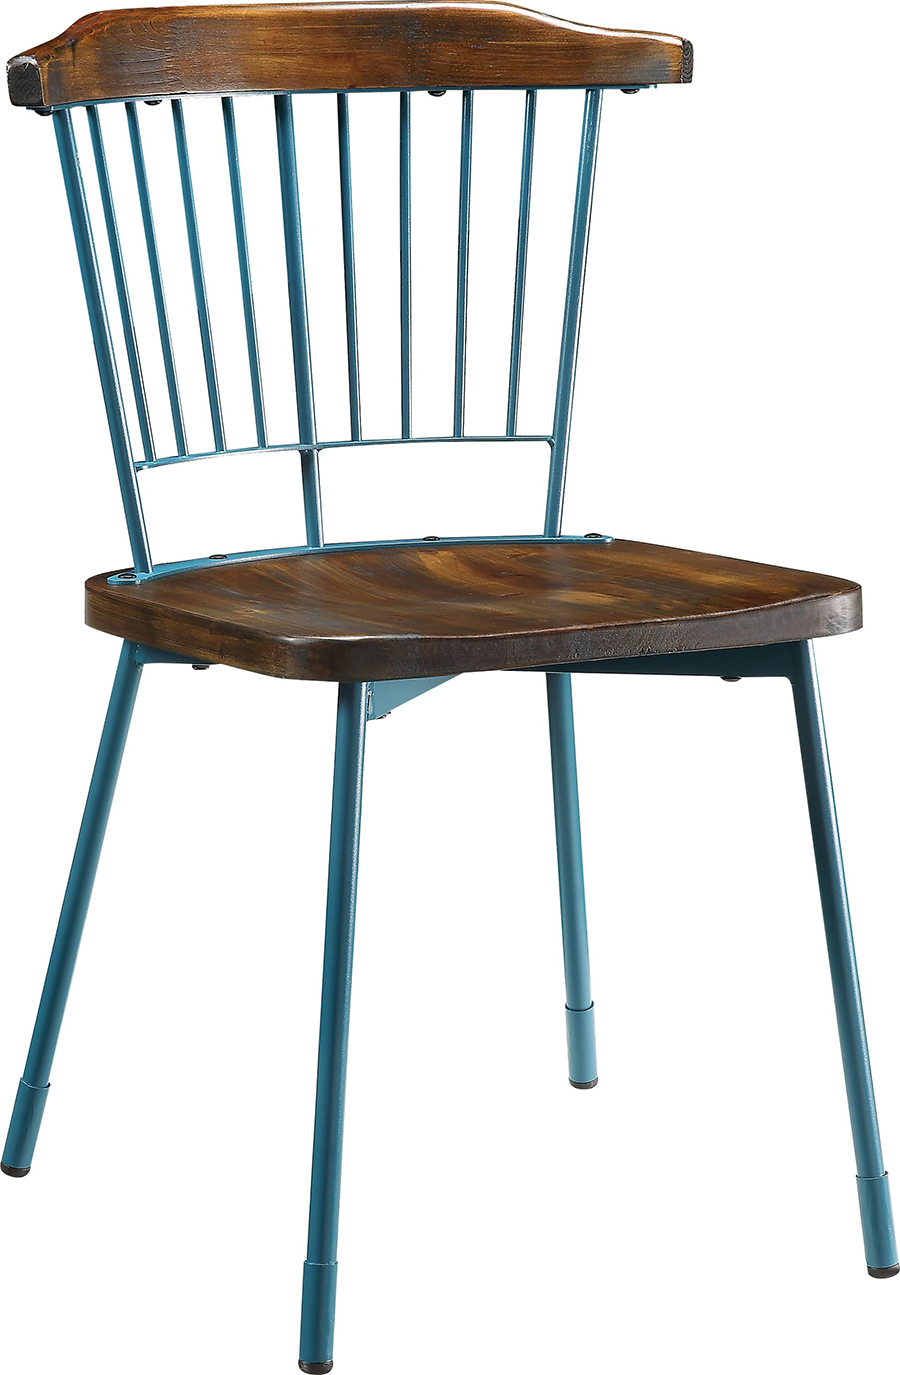 Teal & Brown Oak Side Chair Angle